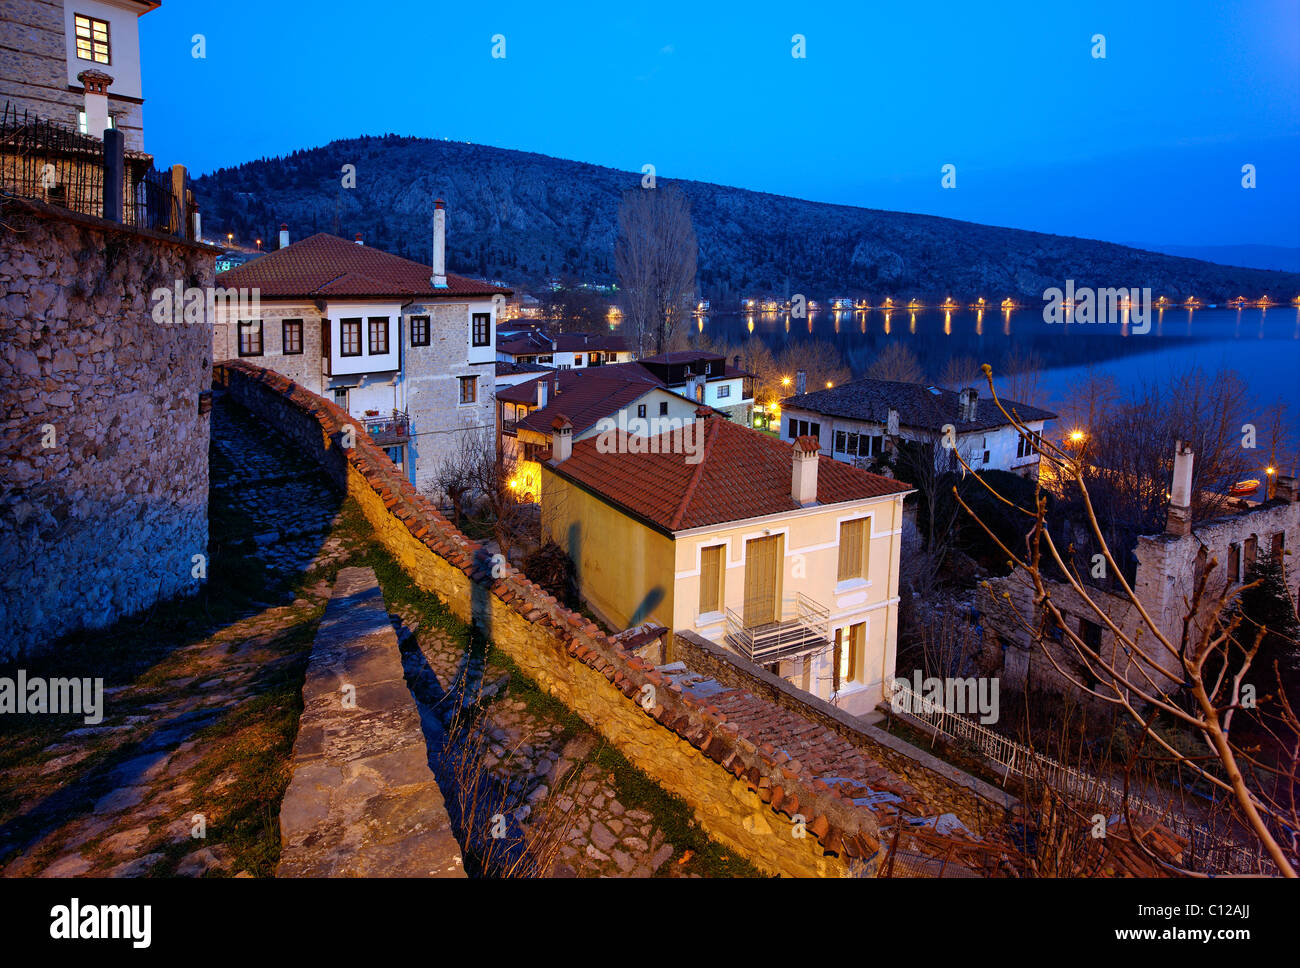 Night falling in picturesque Doltso neighborhood, right beside lake Orestias (or 'Orestiada'), Kastoria - Stock Image